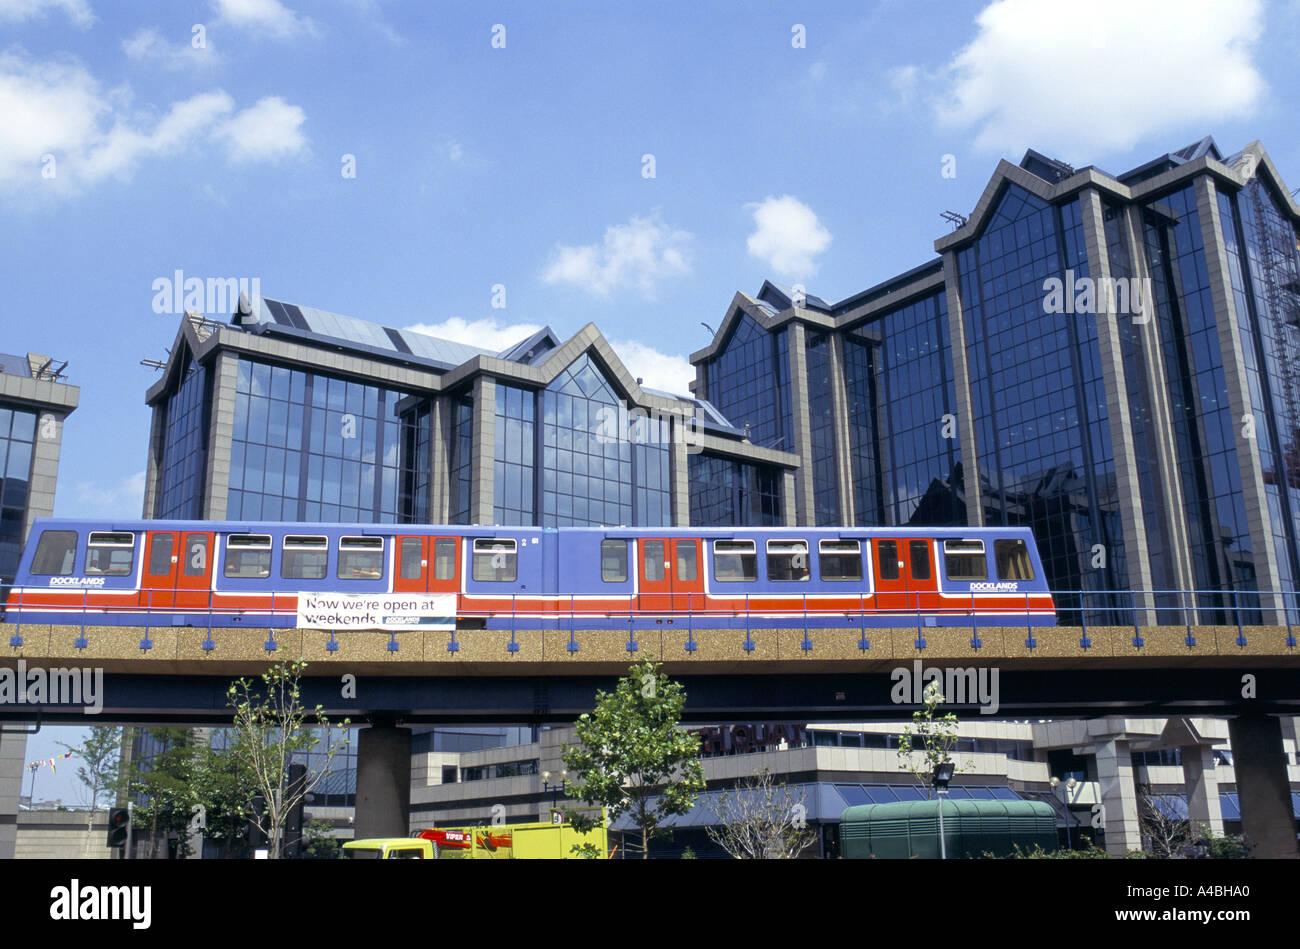 THE DOCKLANDS LIGHT RAILWAY RUNNING ON OVERGROUND TRACK ALONGSIDE  BUSINESS BUILDINGS LONDON, ENGLAND 1999 - Stock Image